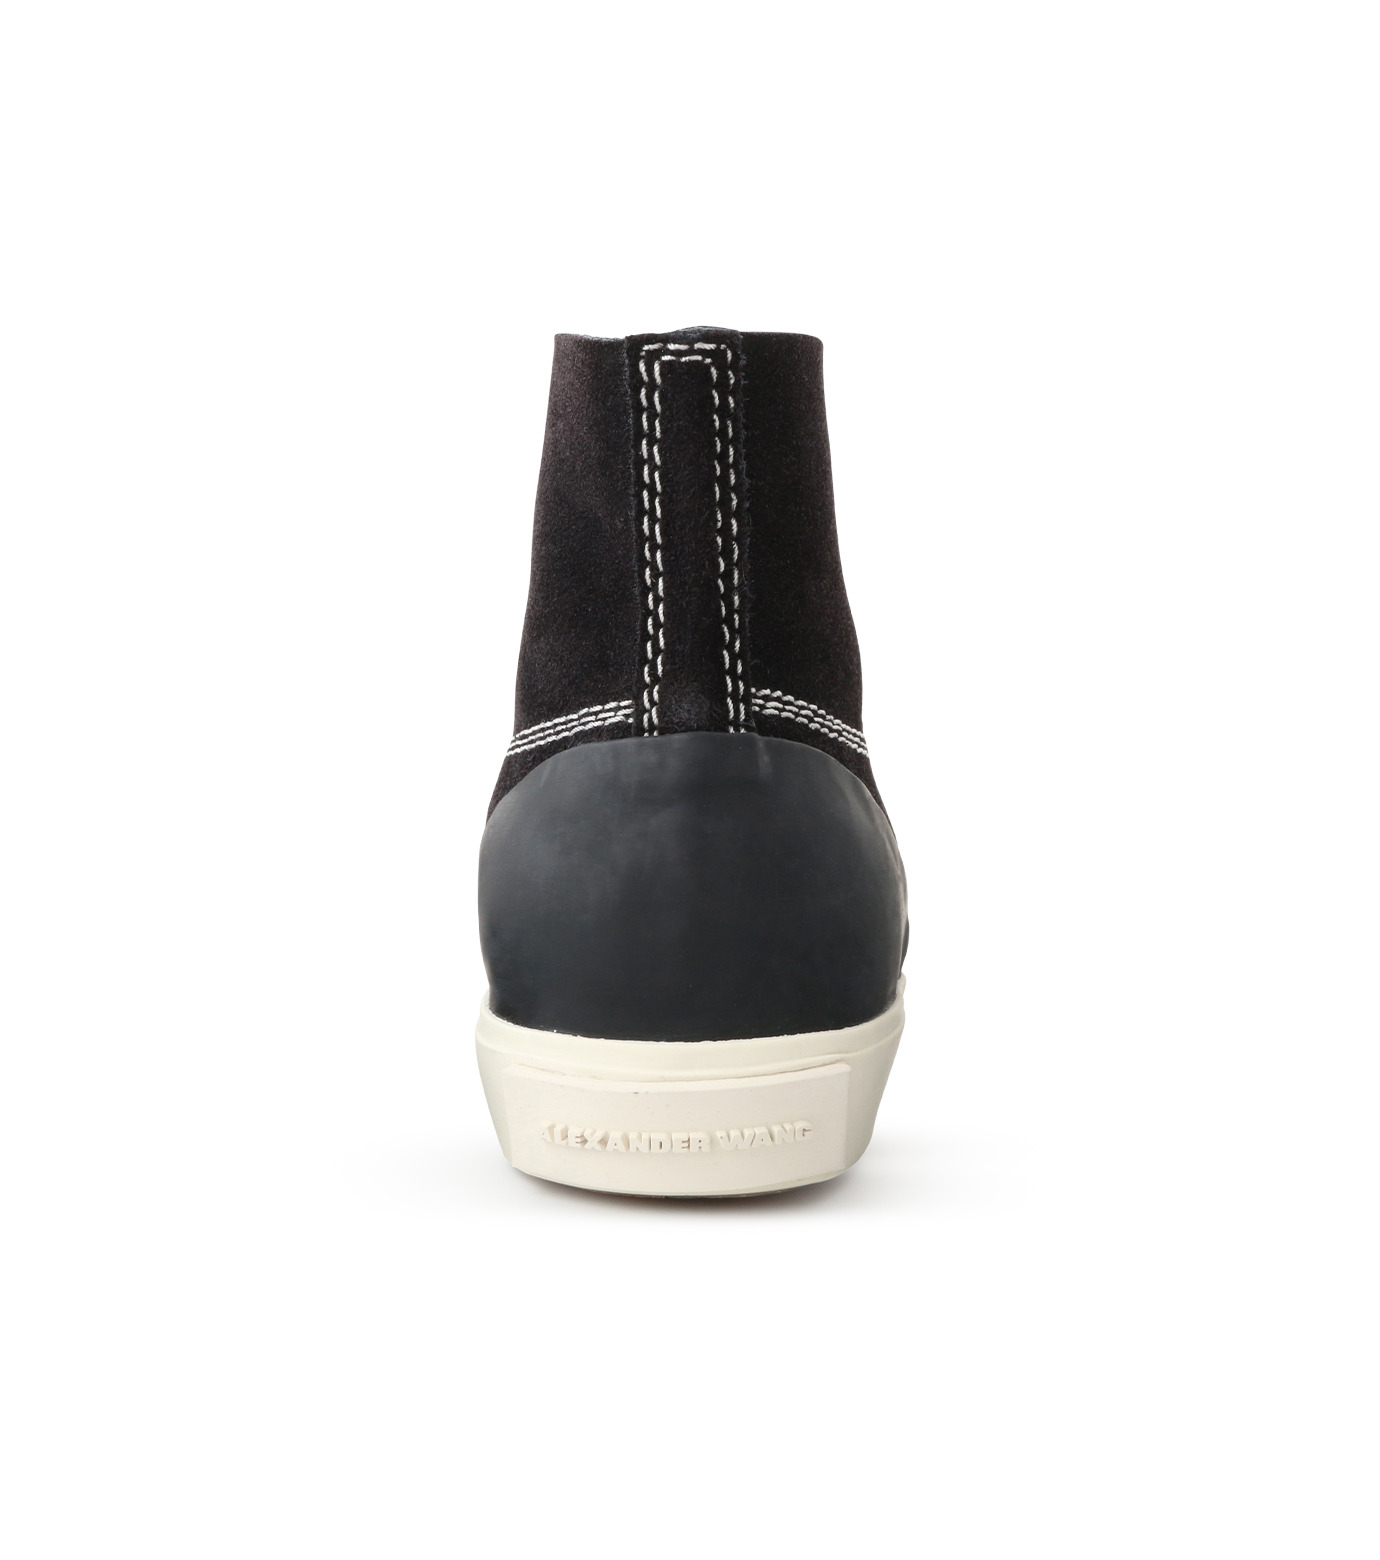 Alexander Wang(アレキサンダーワン)のHicut Sneaker-BLACK(スニーカー/sneaker)-315122F16-13 拡大詳細画像2